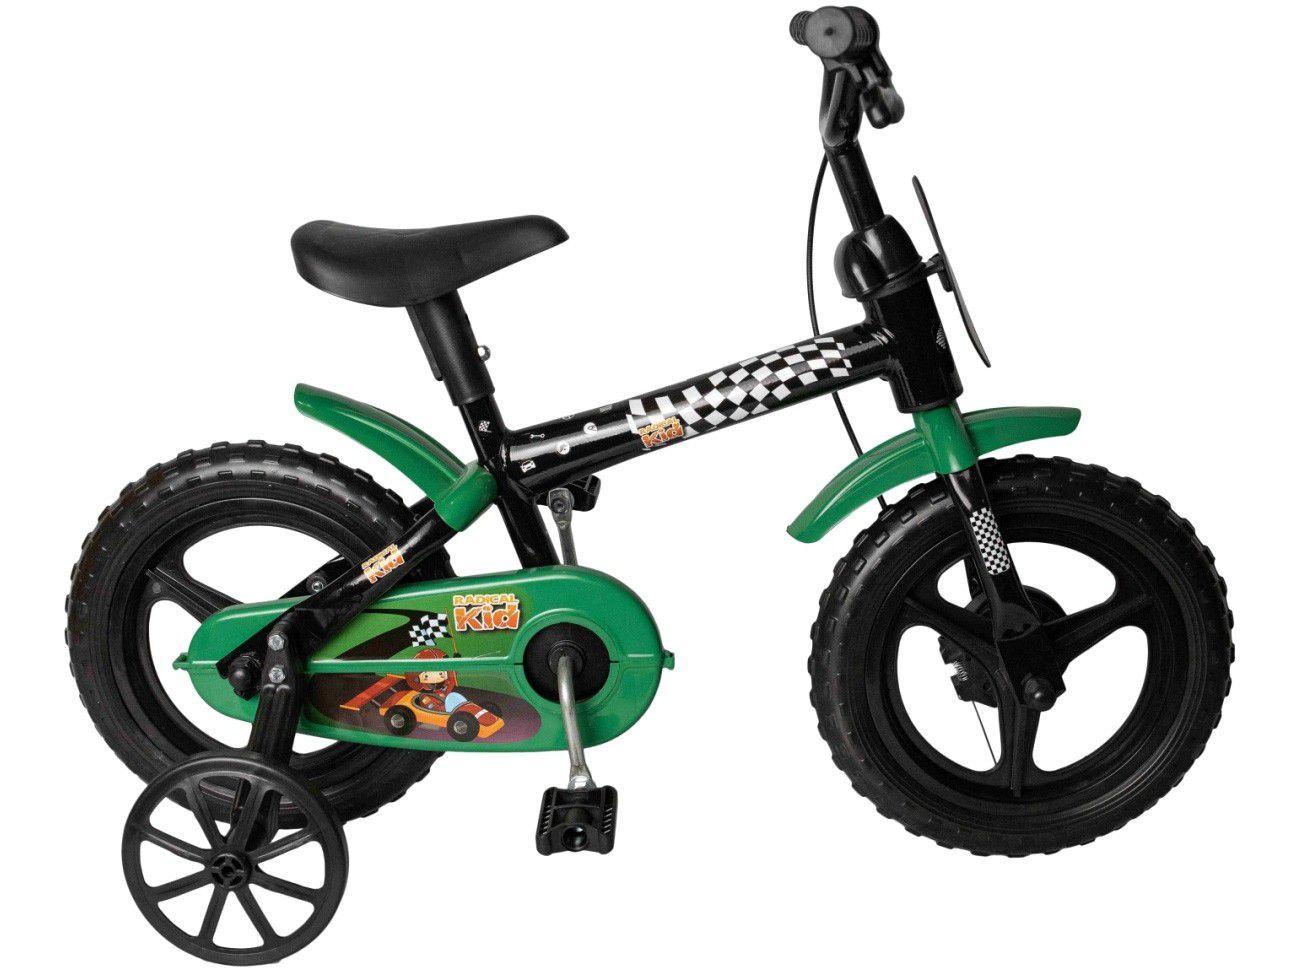 Bicicleta Infantil Aro 12 Styll Kids Radical Kid - Verde e Preto